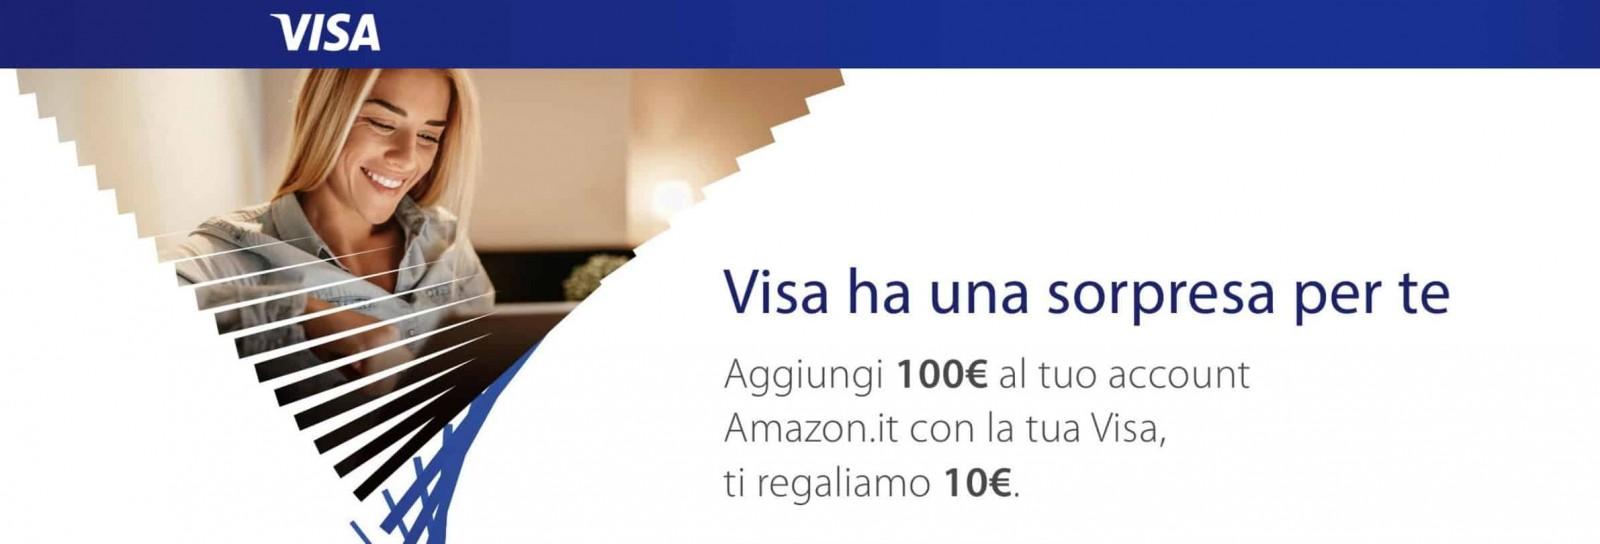 Amazon regala 10 euro se ricarichi 100 con carta Visa